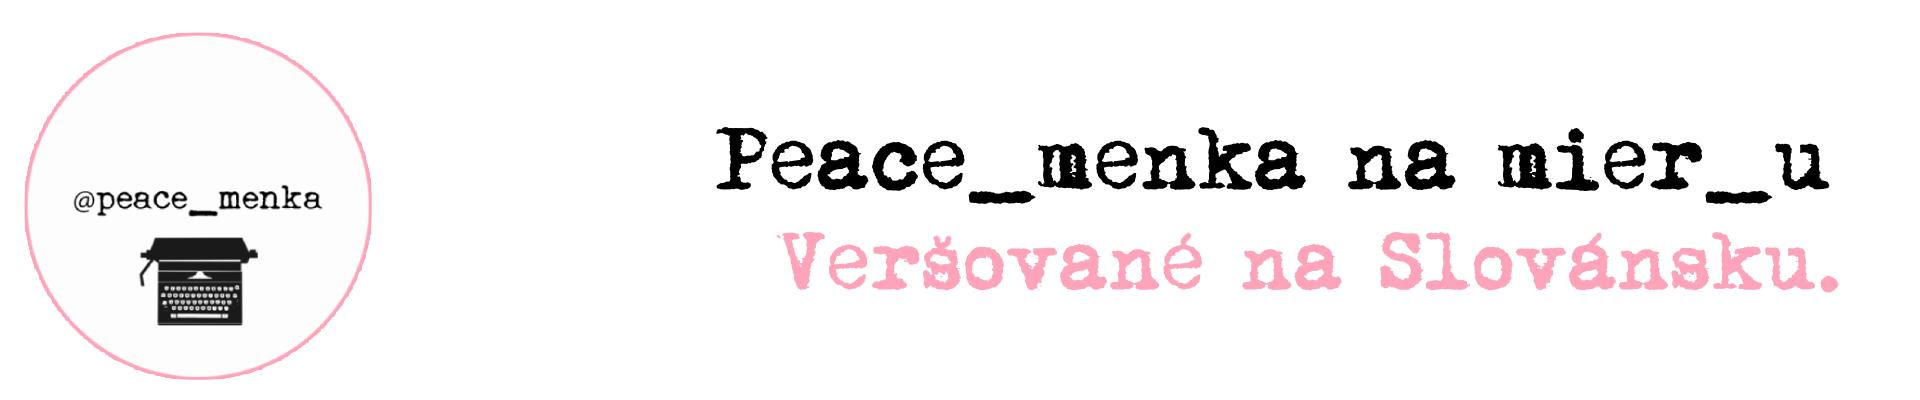 Peace_menka